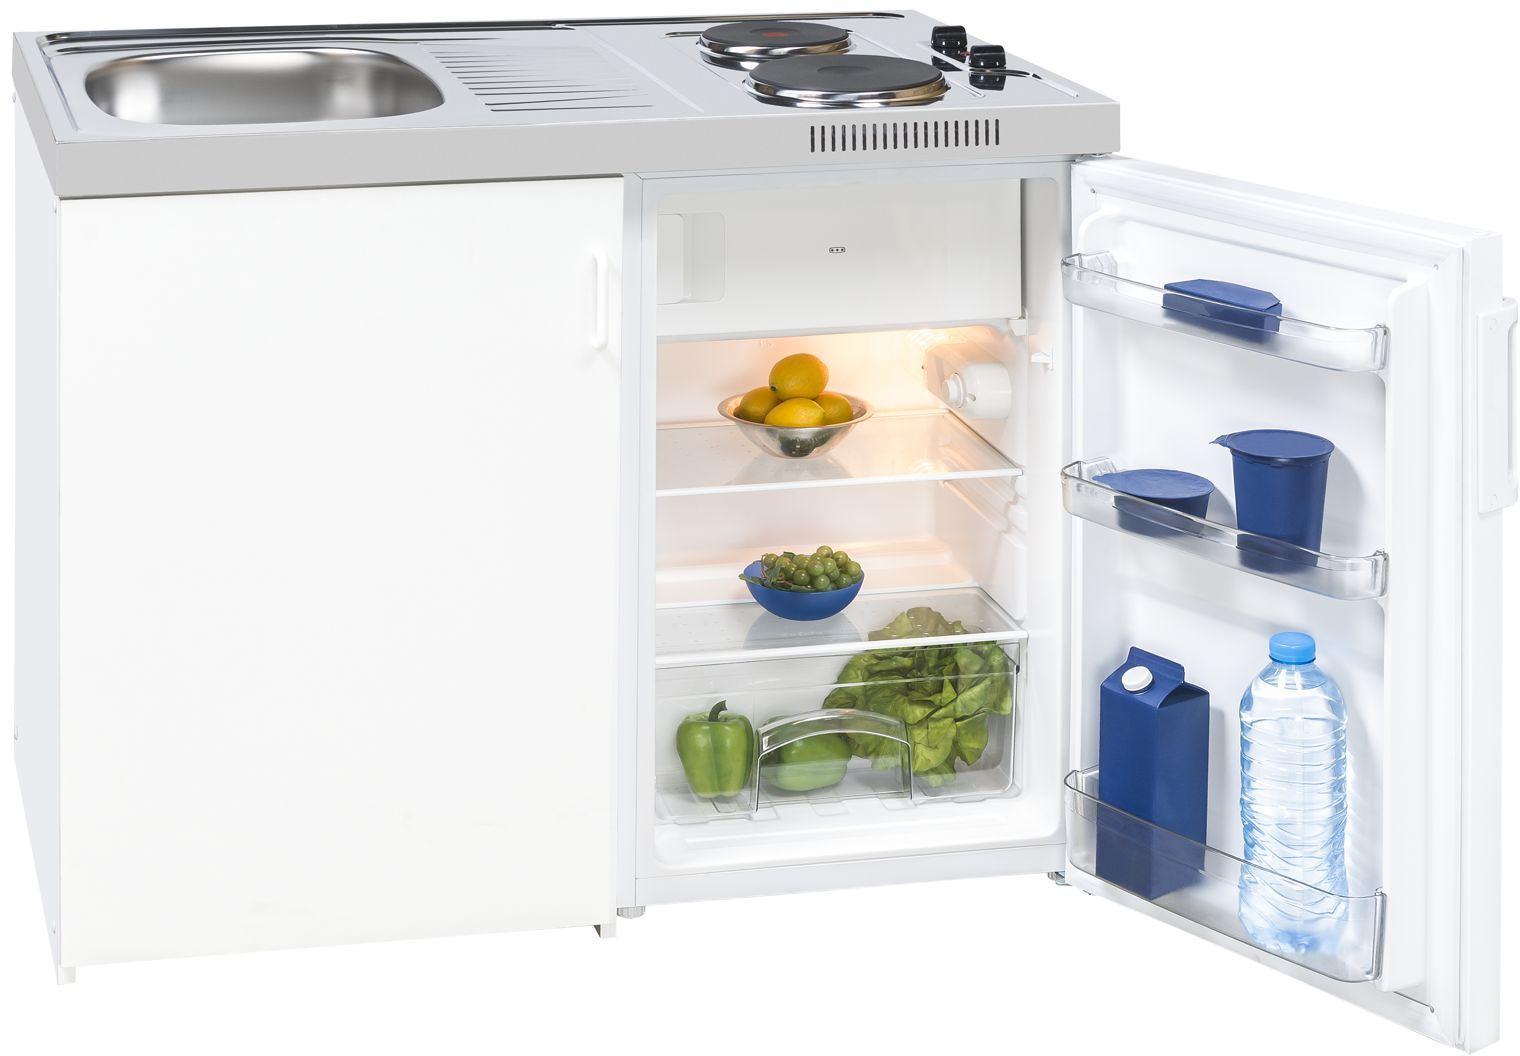 Full Size of Miniküche Mit Kühlschrank 90 Cm Miniküche Mit Kühlschrank Buche Miniküche 120 Cm Breit Mit Kühlschrank Miniküche Mit Kühlschrank 150 Cm Küche Miniküche Mit Kühlschrank